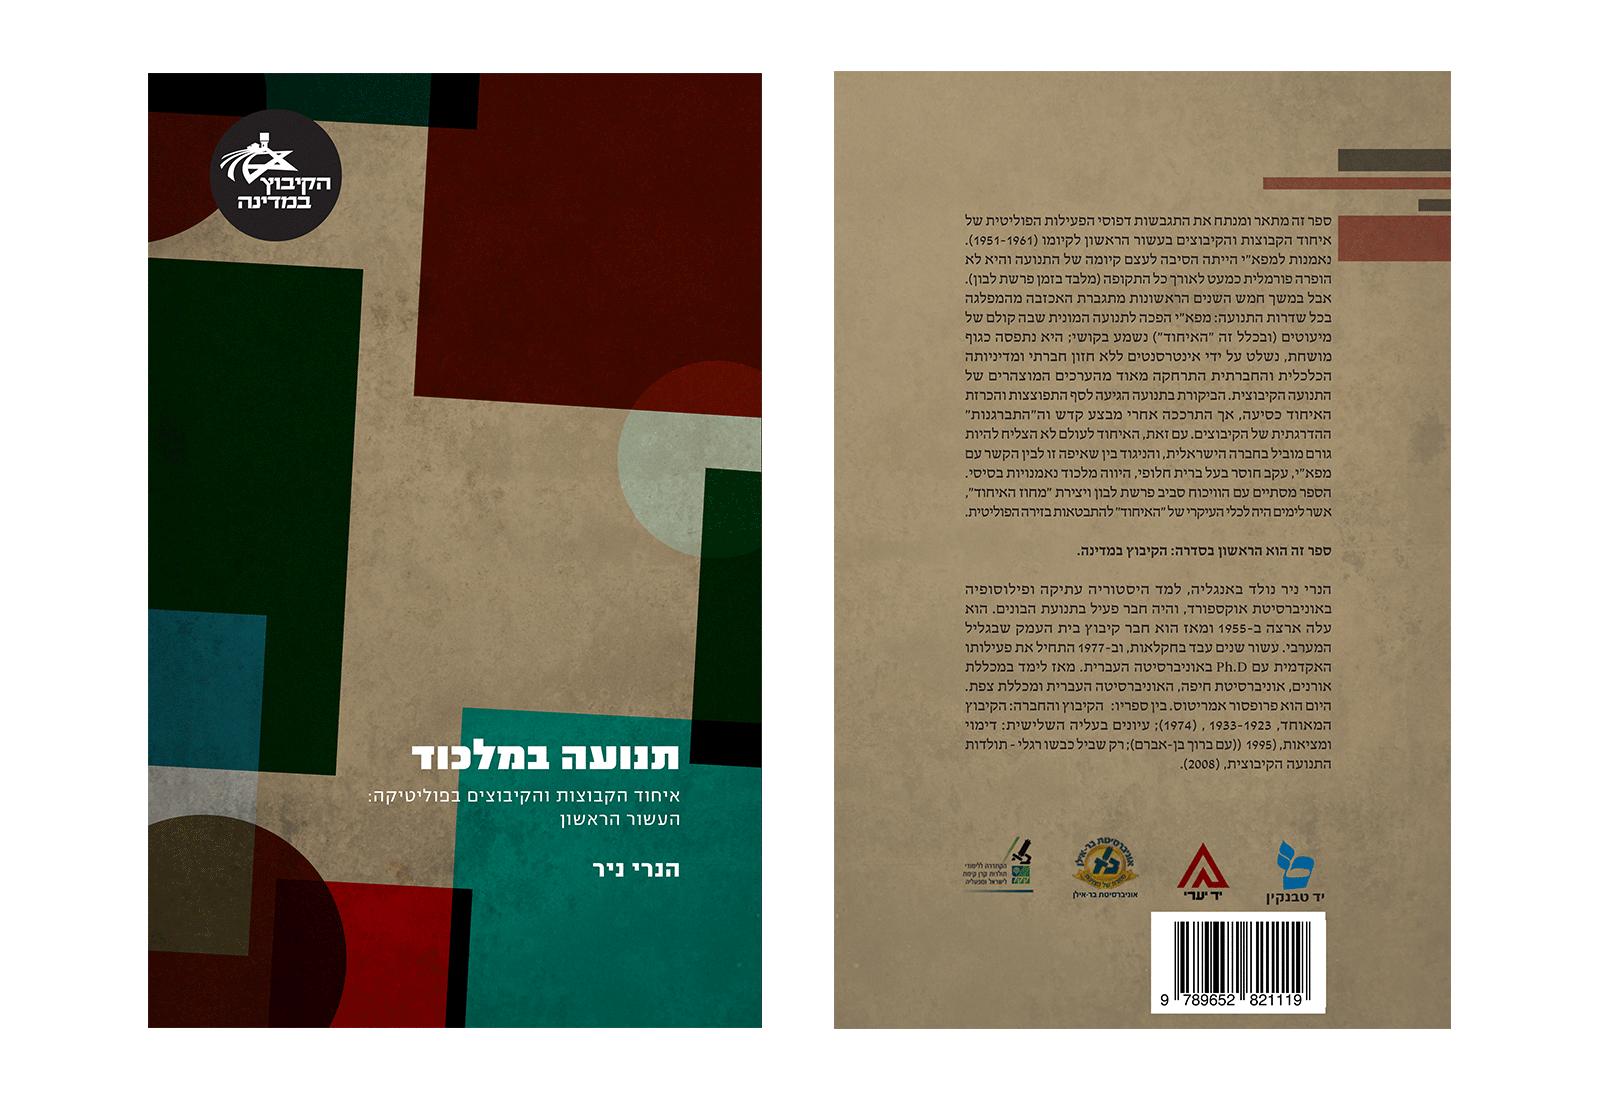 http://bigeyes.co.il/wp-content/uploads/2019/08/kibbutz-books-5.png